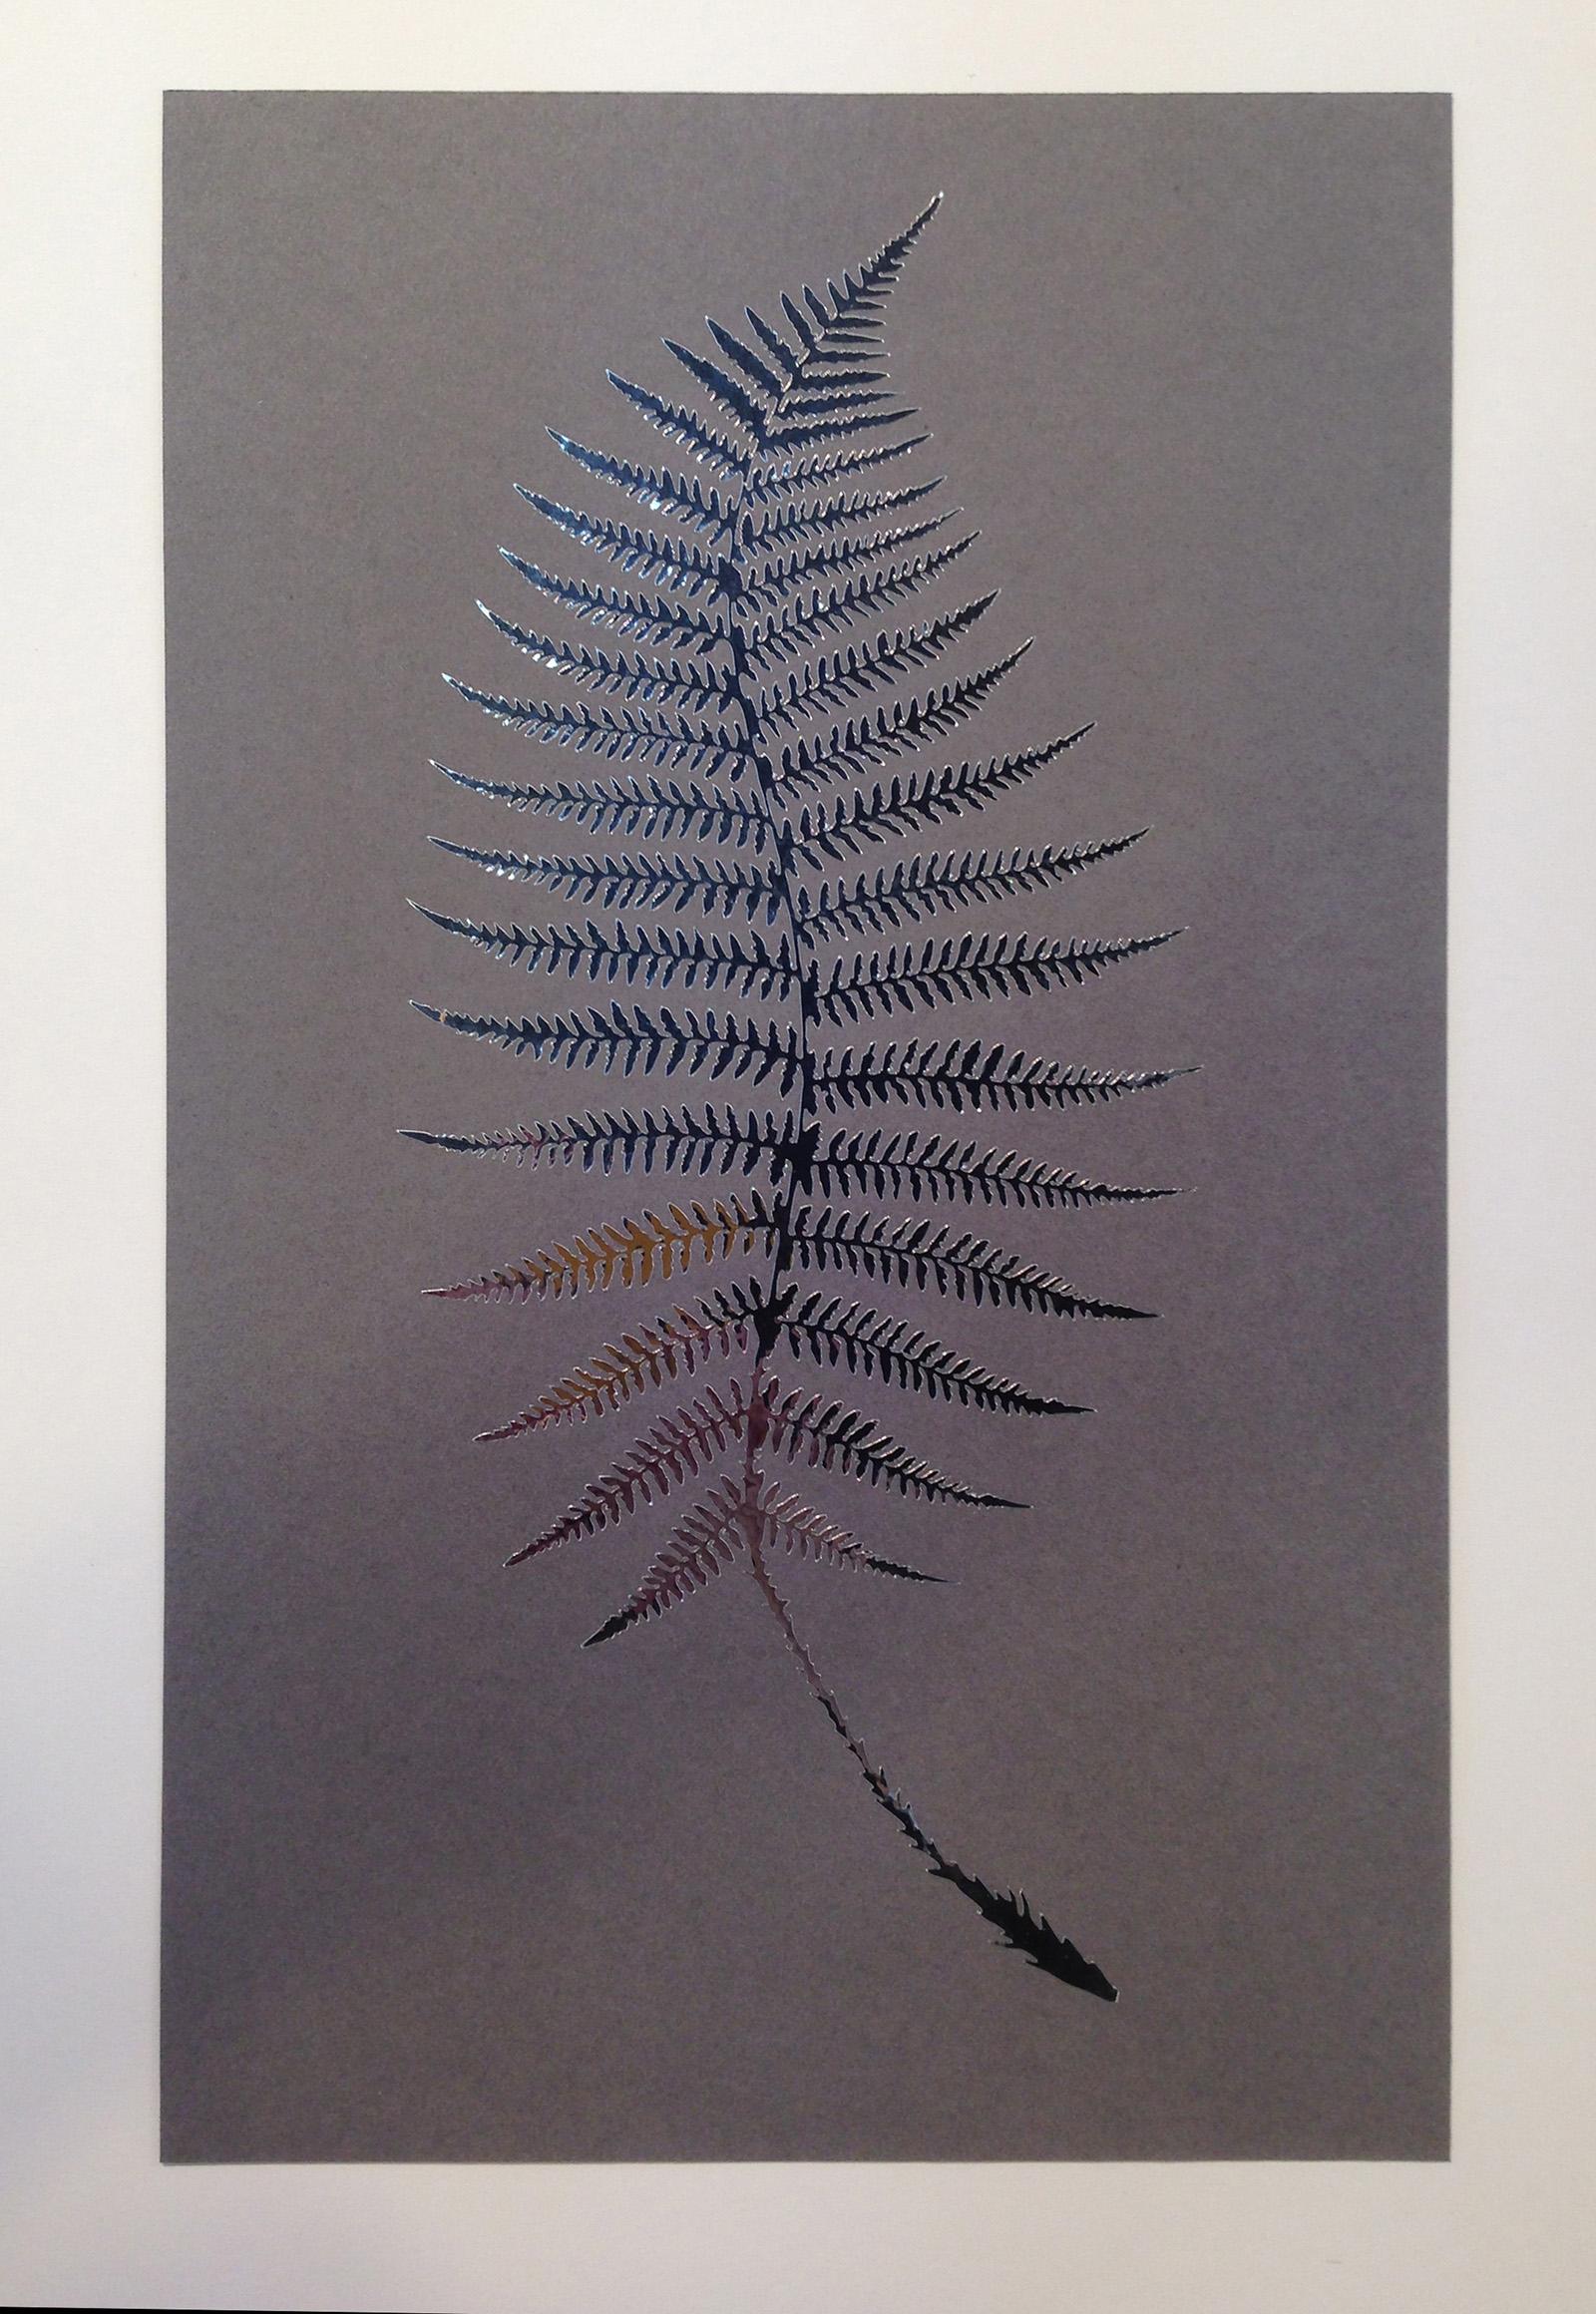 """Fractal #4"", 2014, vinyl on paper, 8 in. x 13 in."